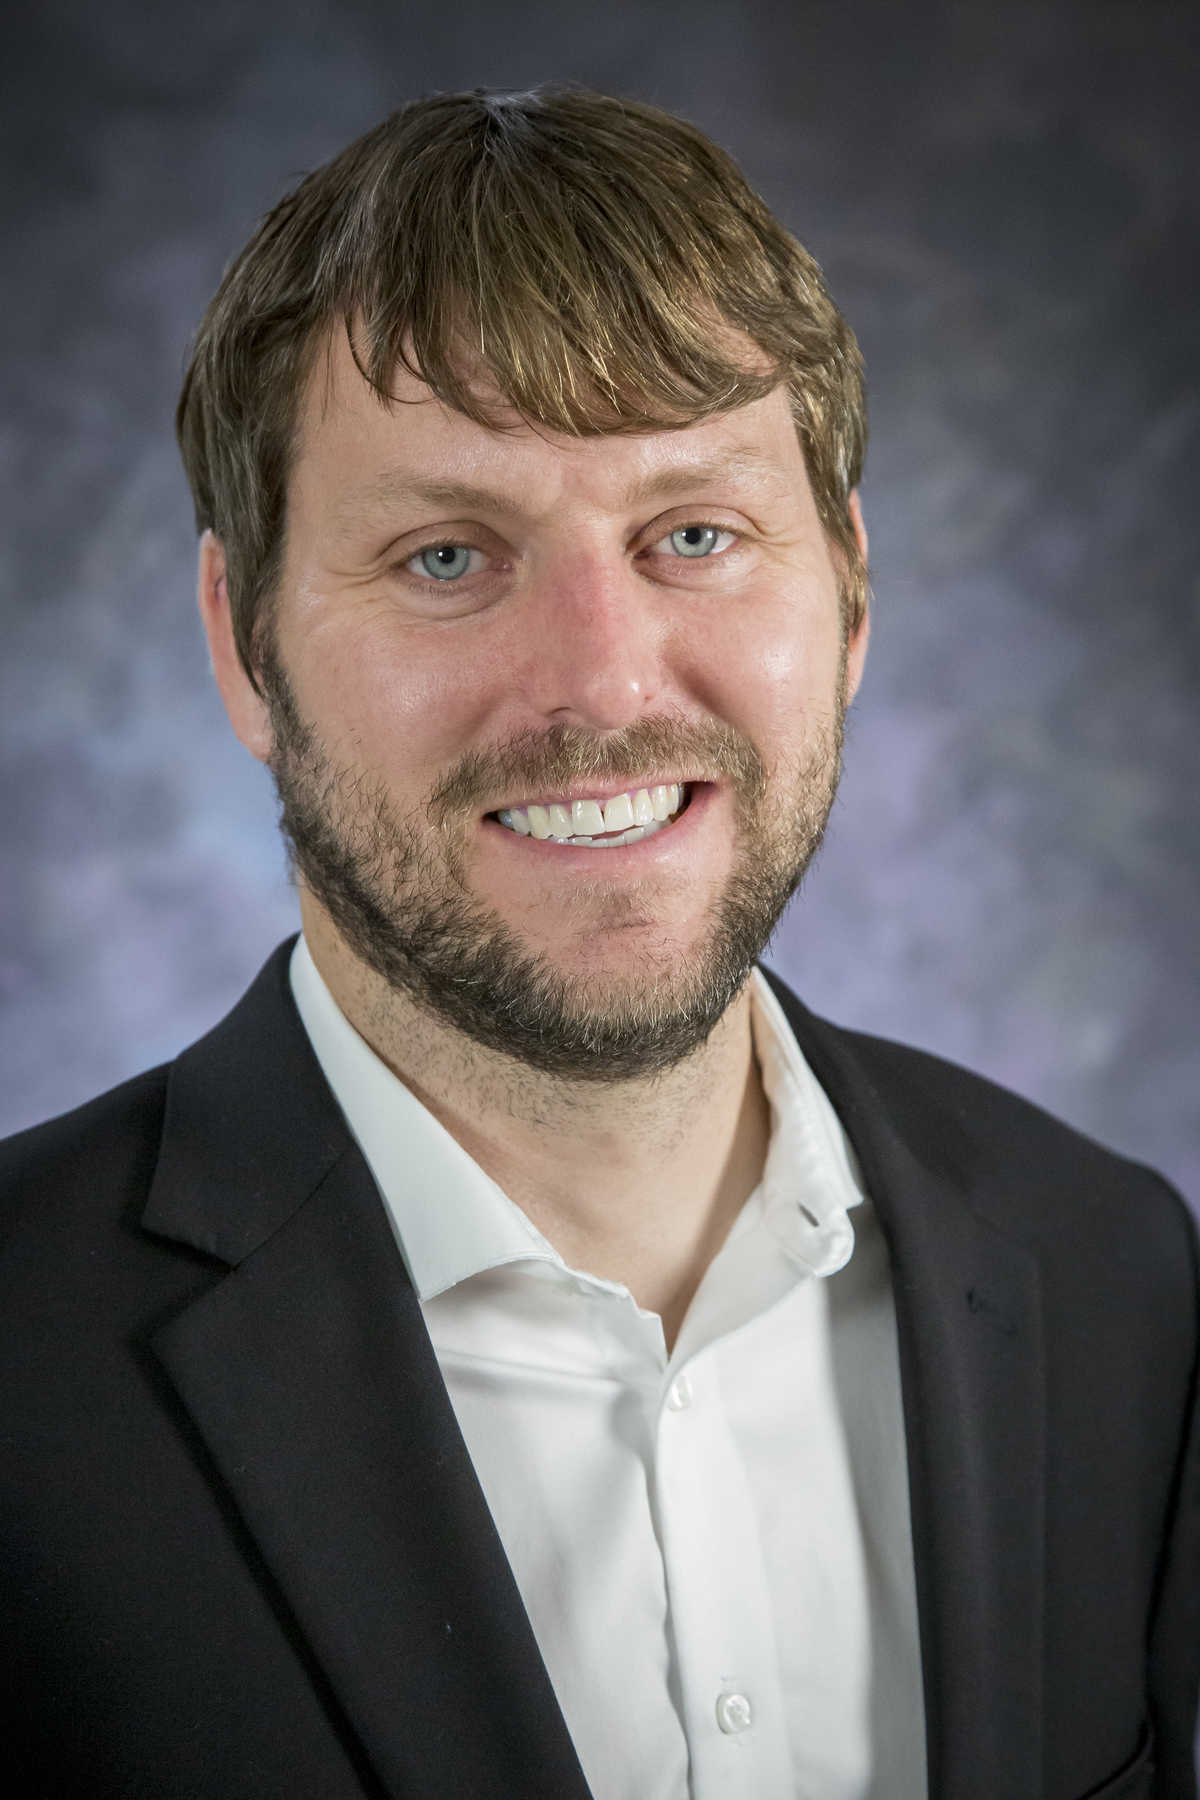 Victor Murray portrait against a blue backdrop